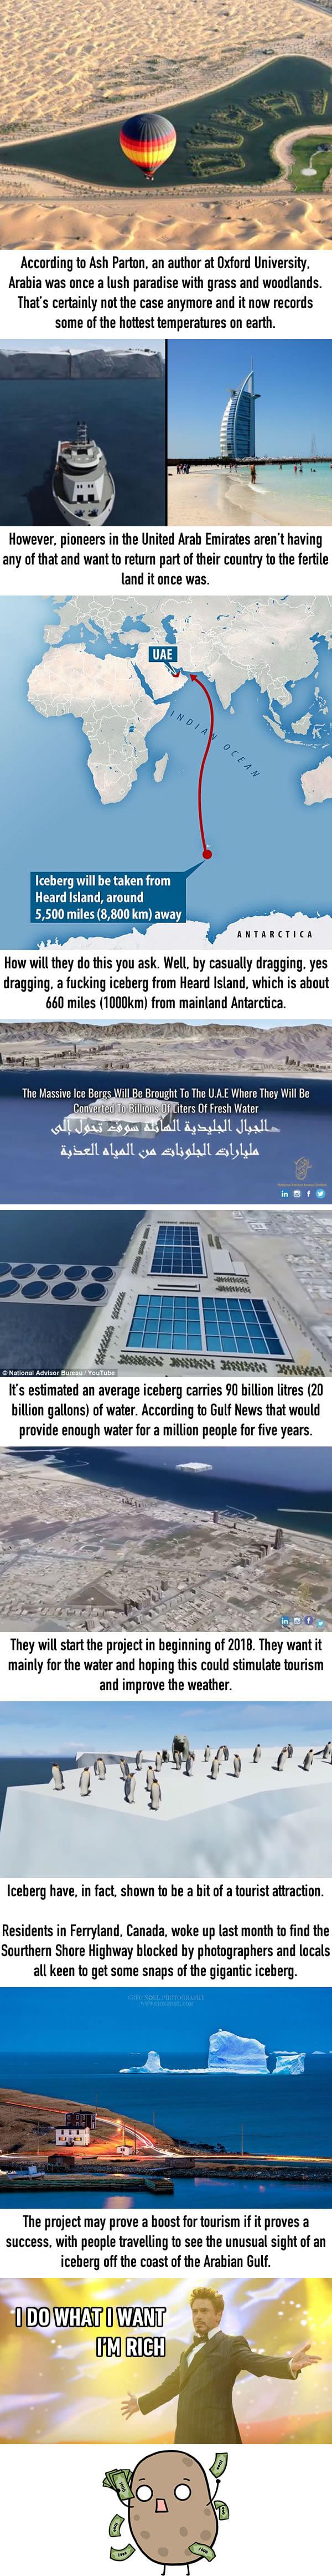 UAE Iceberg Project